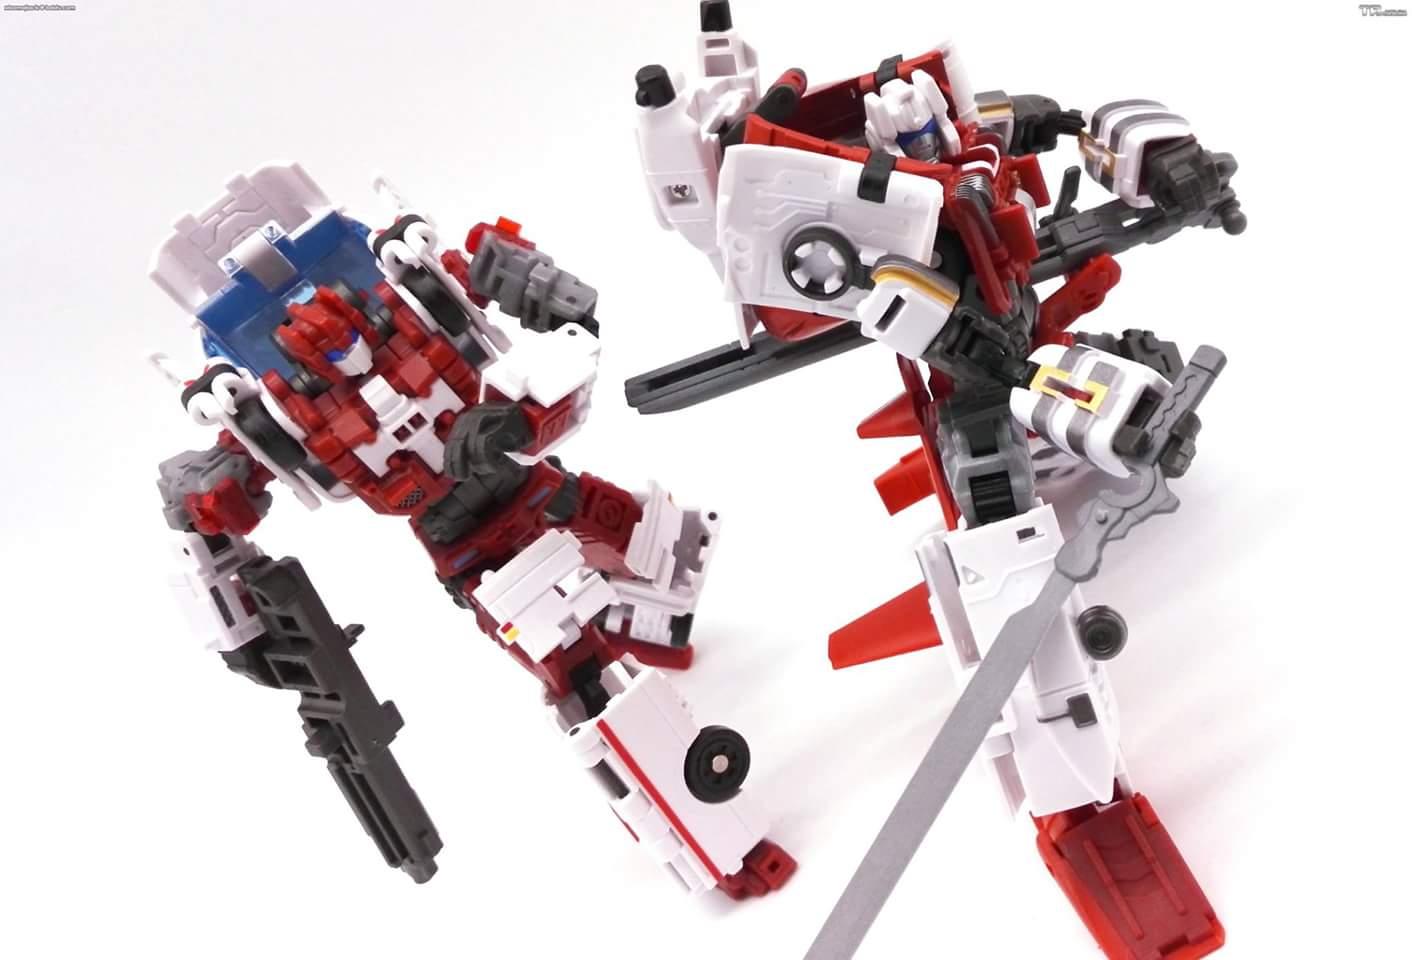 [MakeToys] Produit Tiers - Jouet MTCM-04 Guardia (aka Protectobots - Defensor/Defenso) - Page 3 Cthid85r